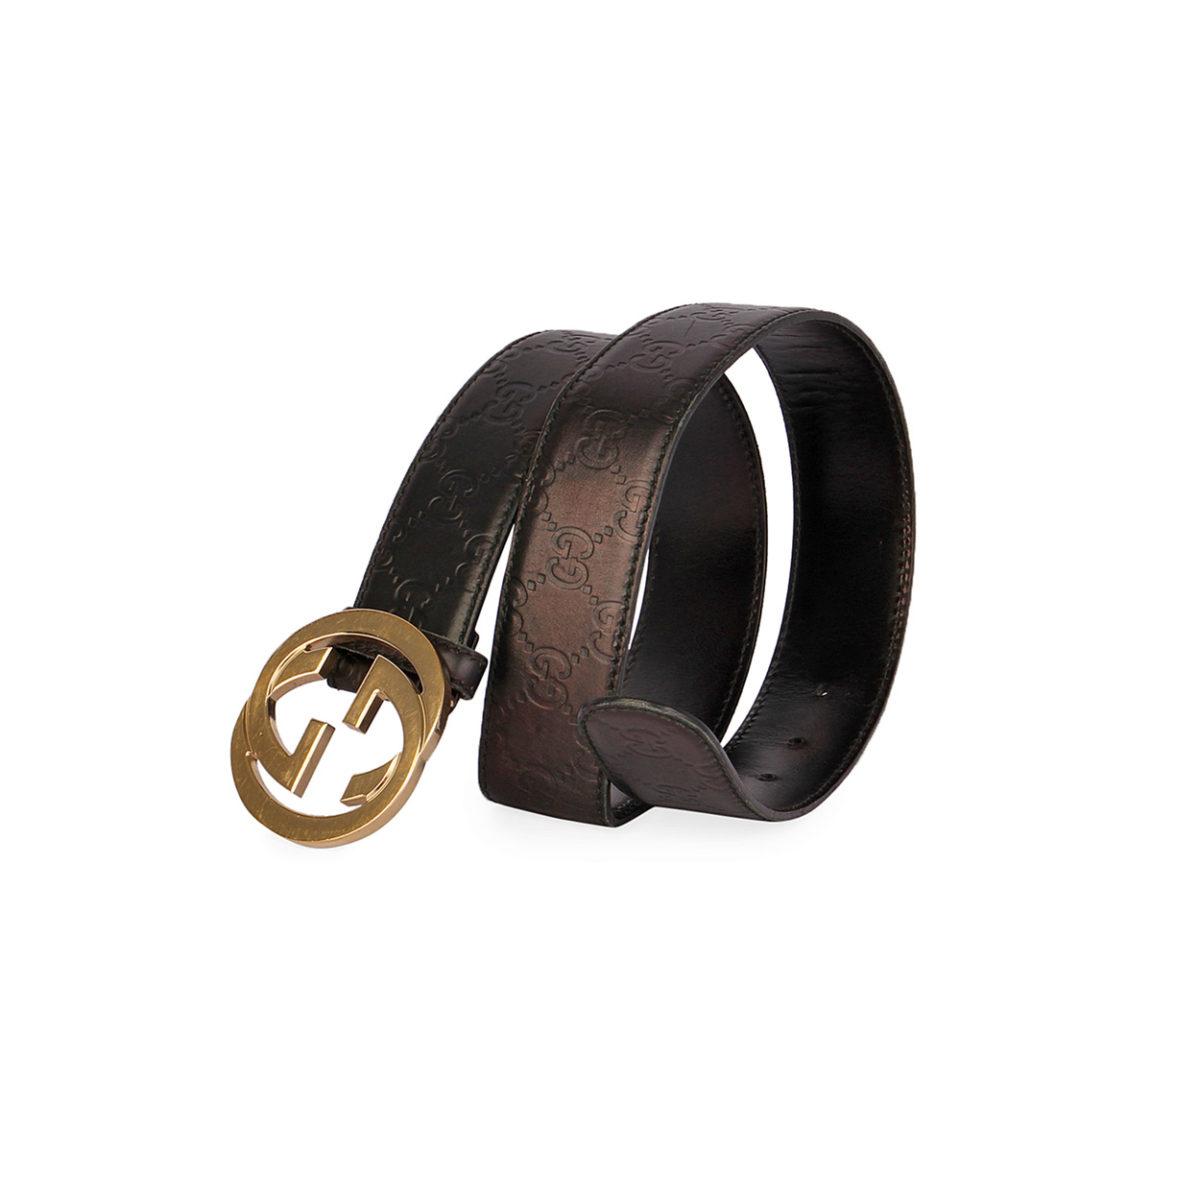 f28a175c8f9 GUCCI Guccissima Belt w  Interlocking GG Buckle Black - 80 (32)